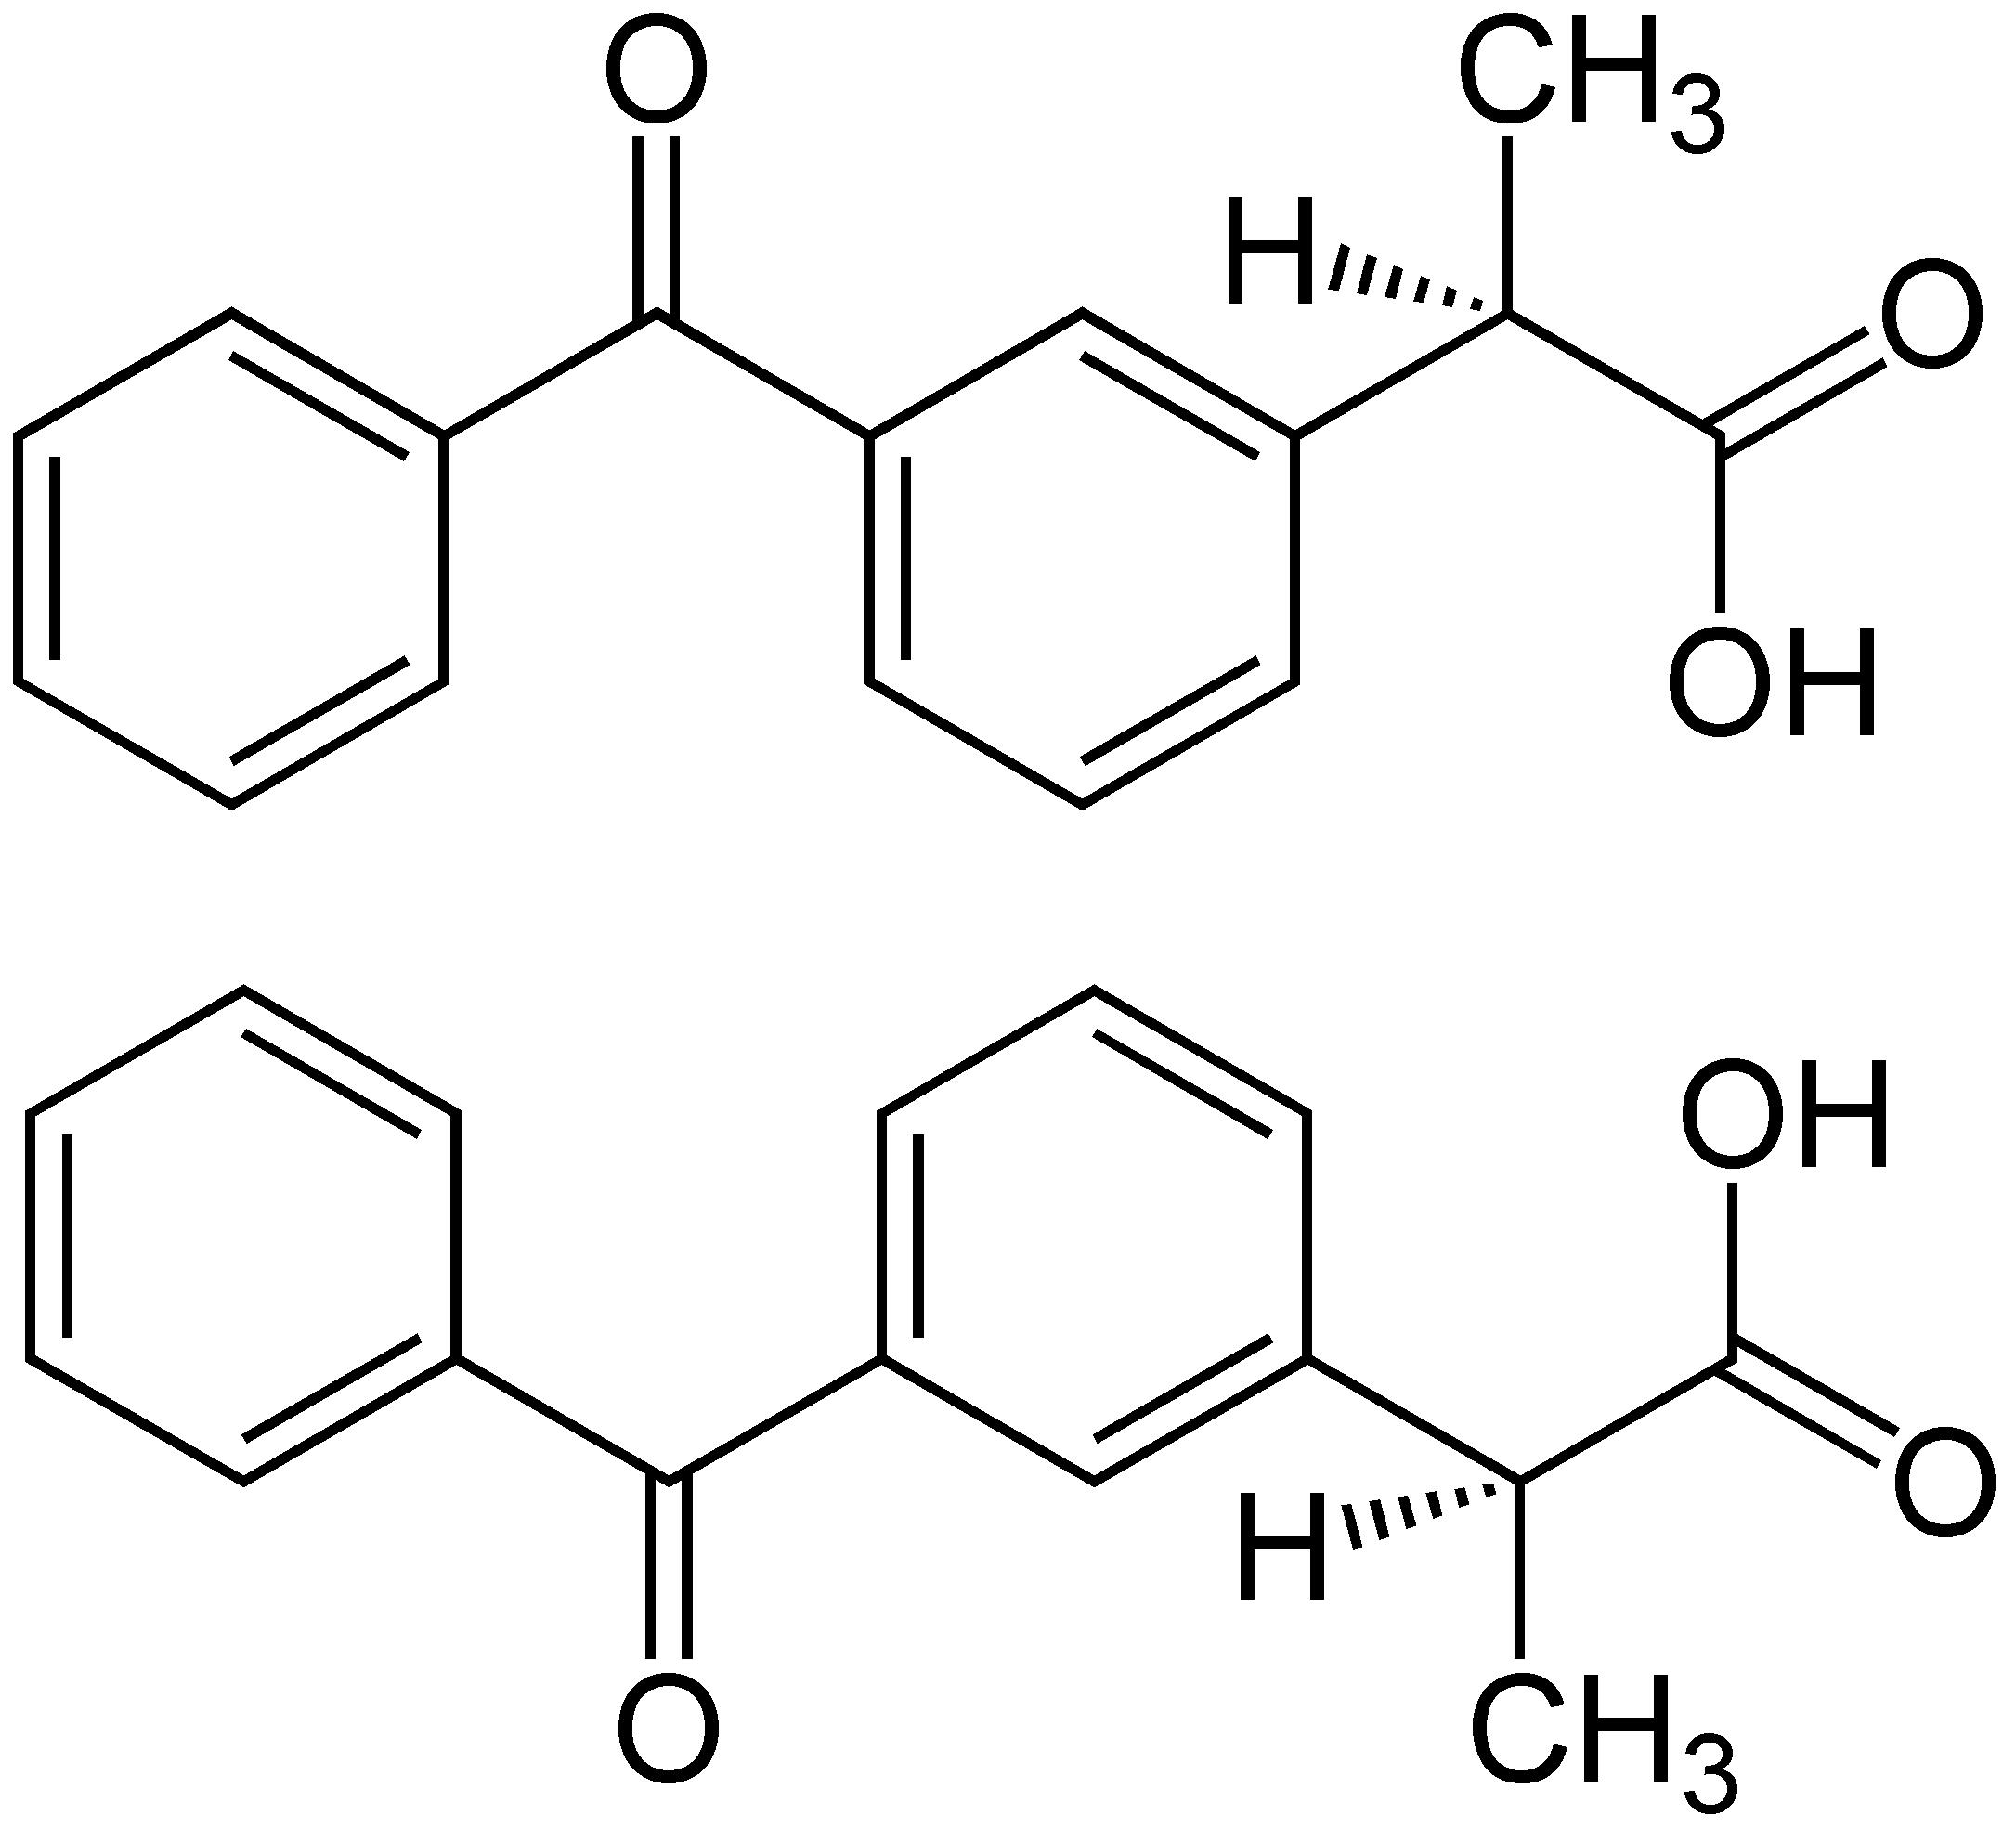 esteroides anabolizantes legales o ilegales